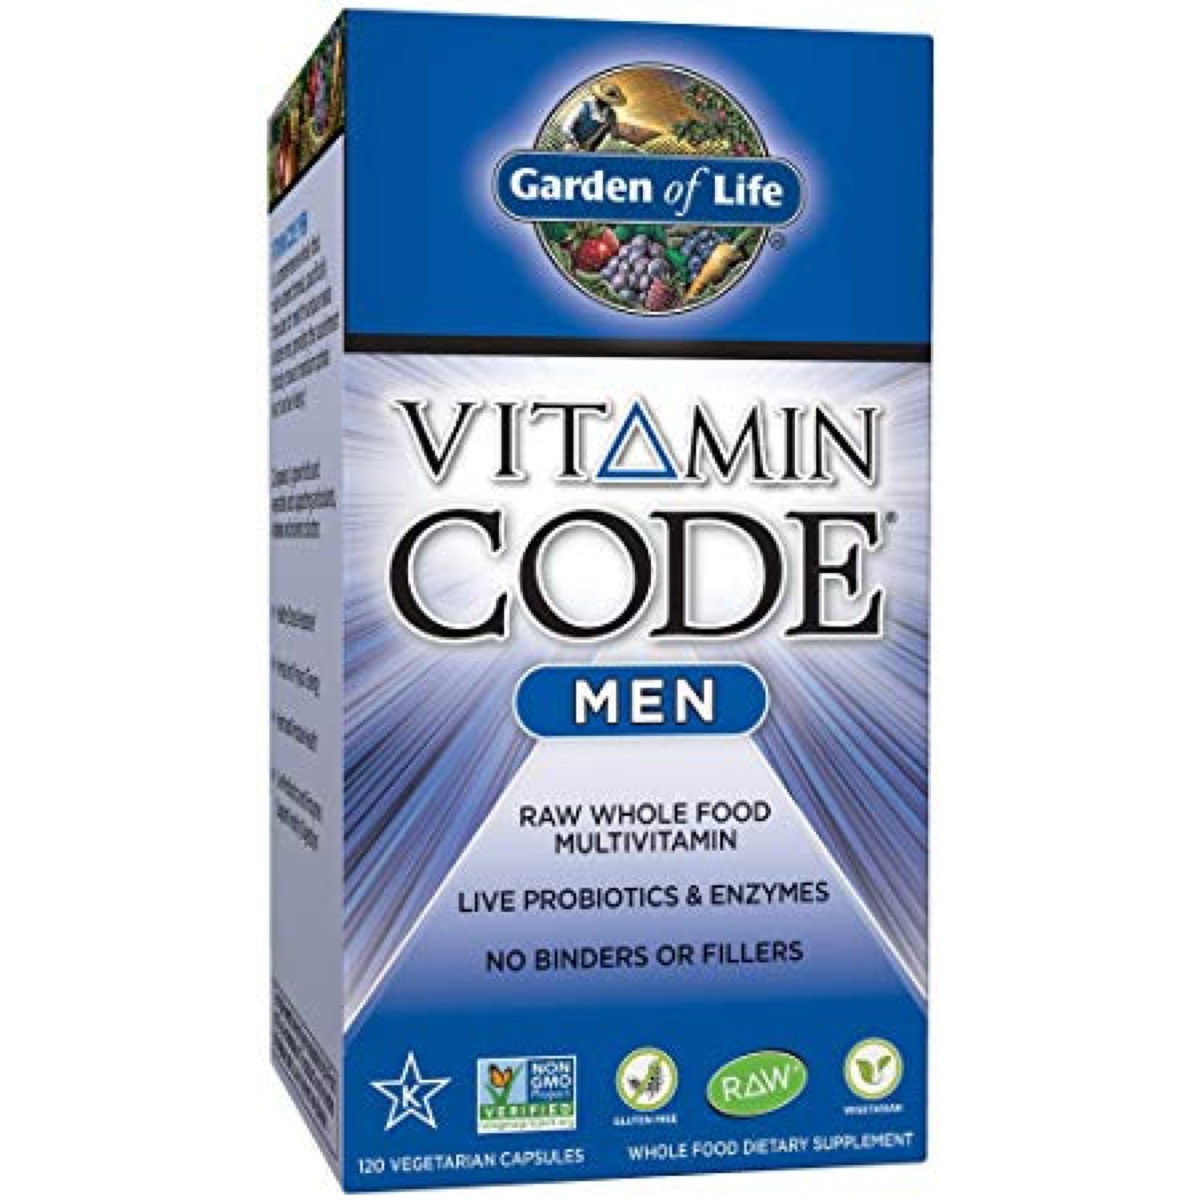 vitamin code men, best multivitamin for men